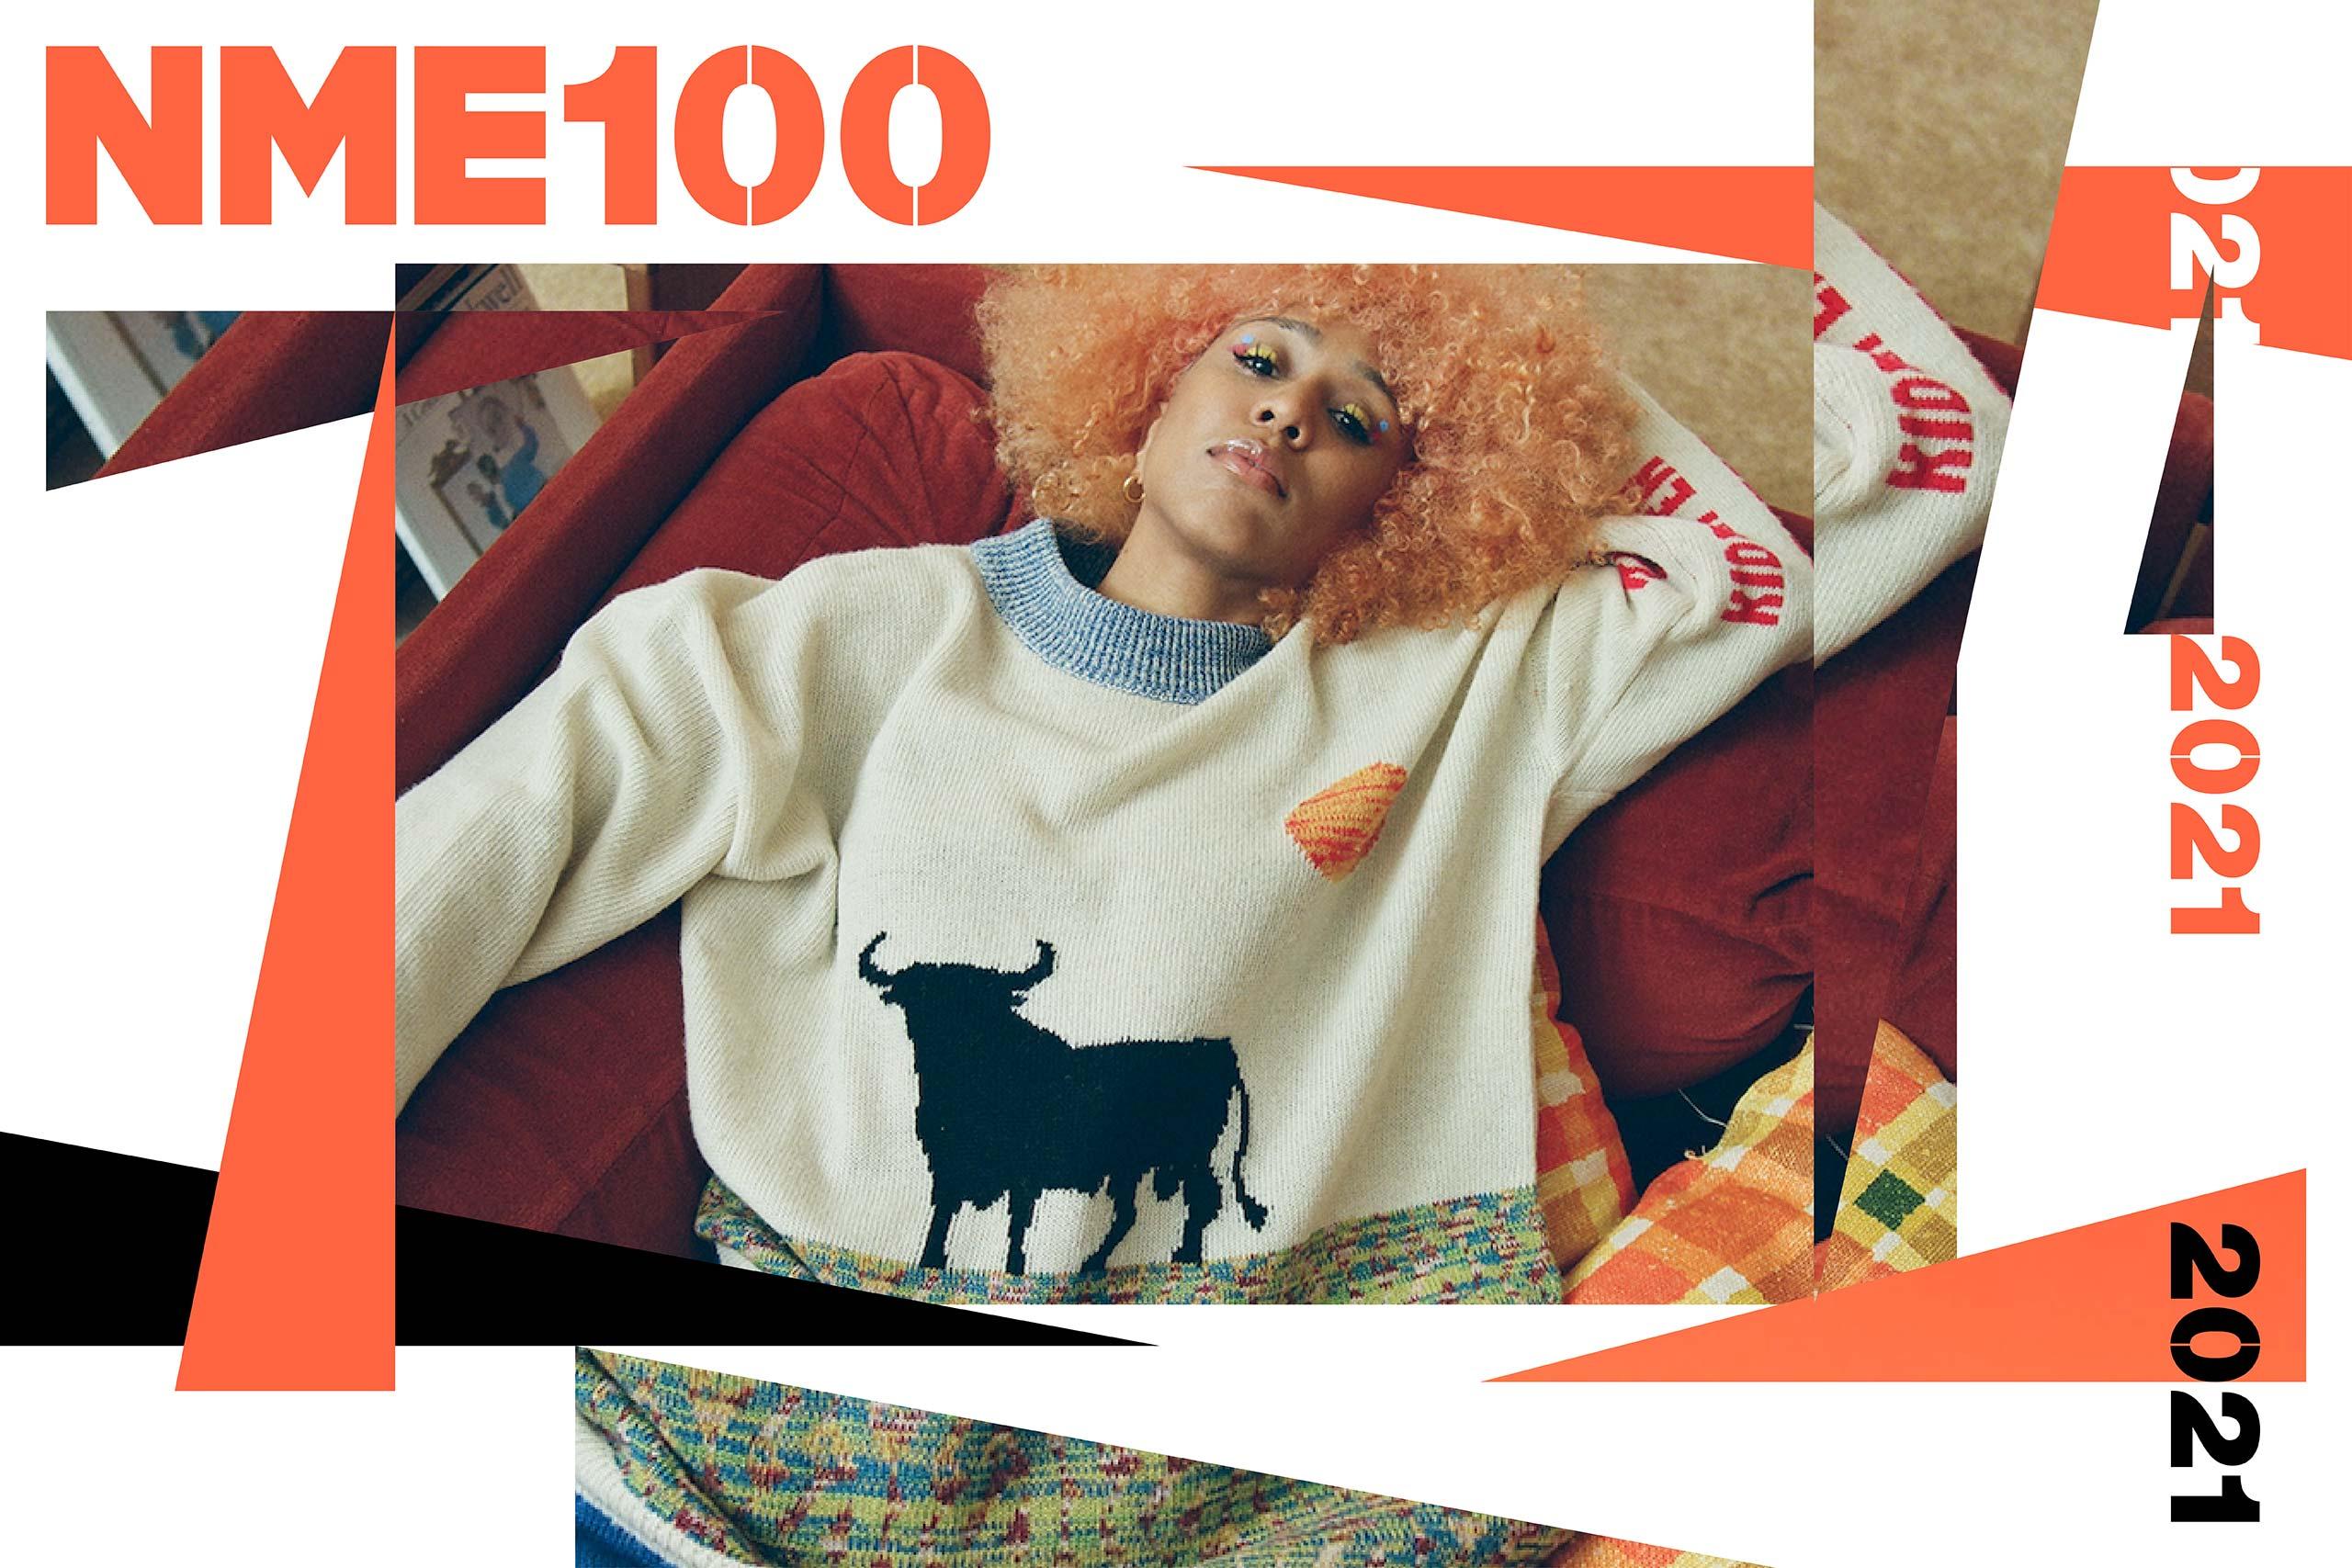 NME 100 foushee